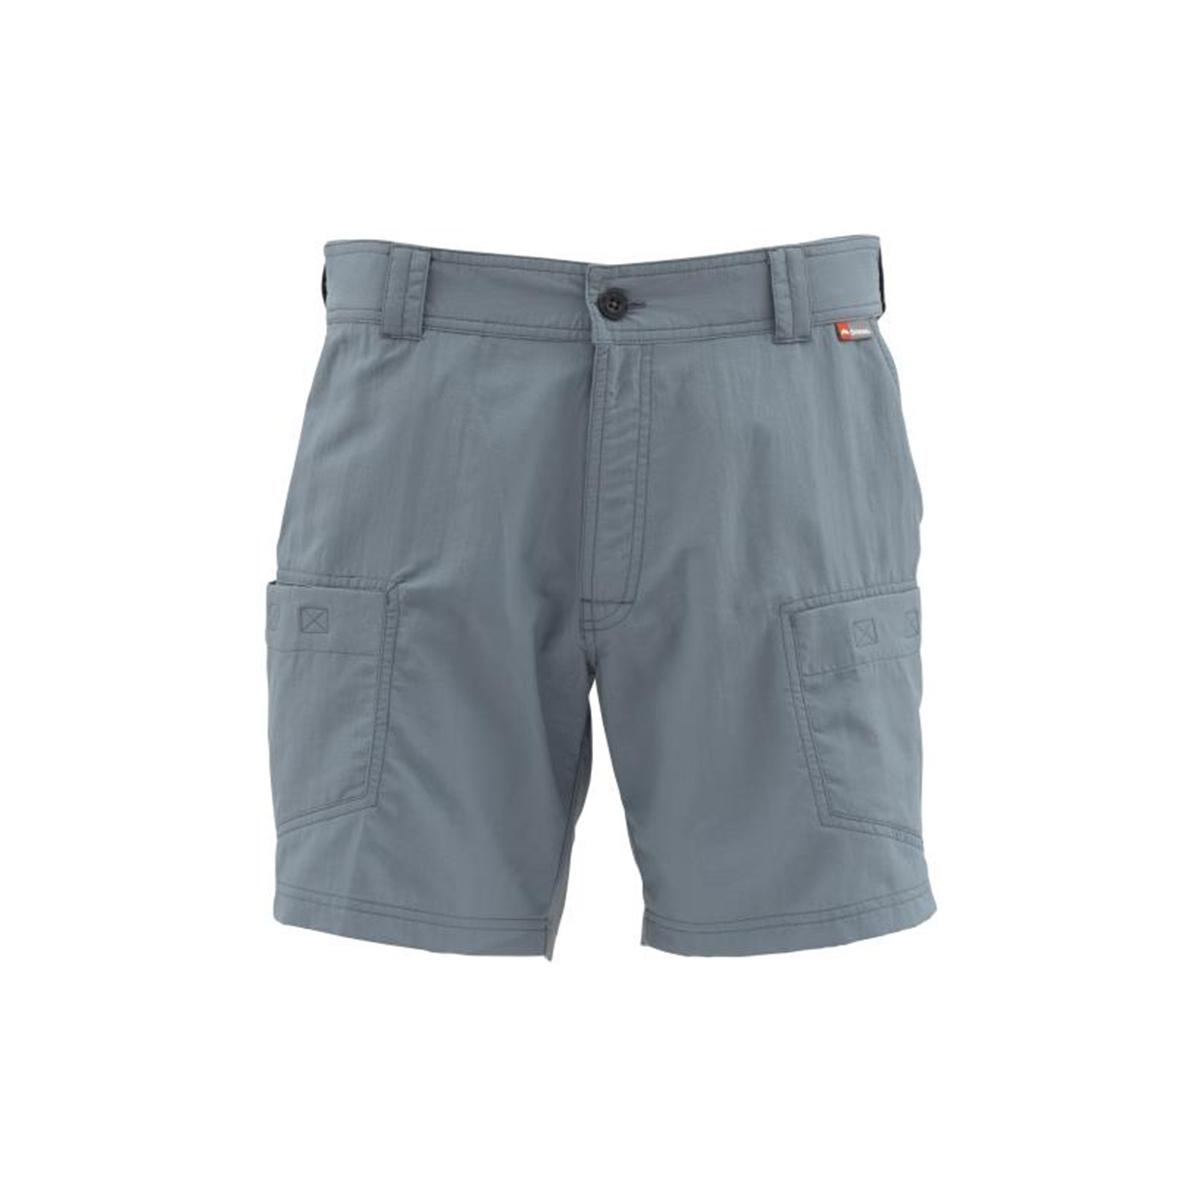 Simms Clothing Men's High Water Short